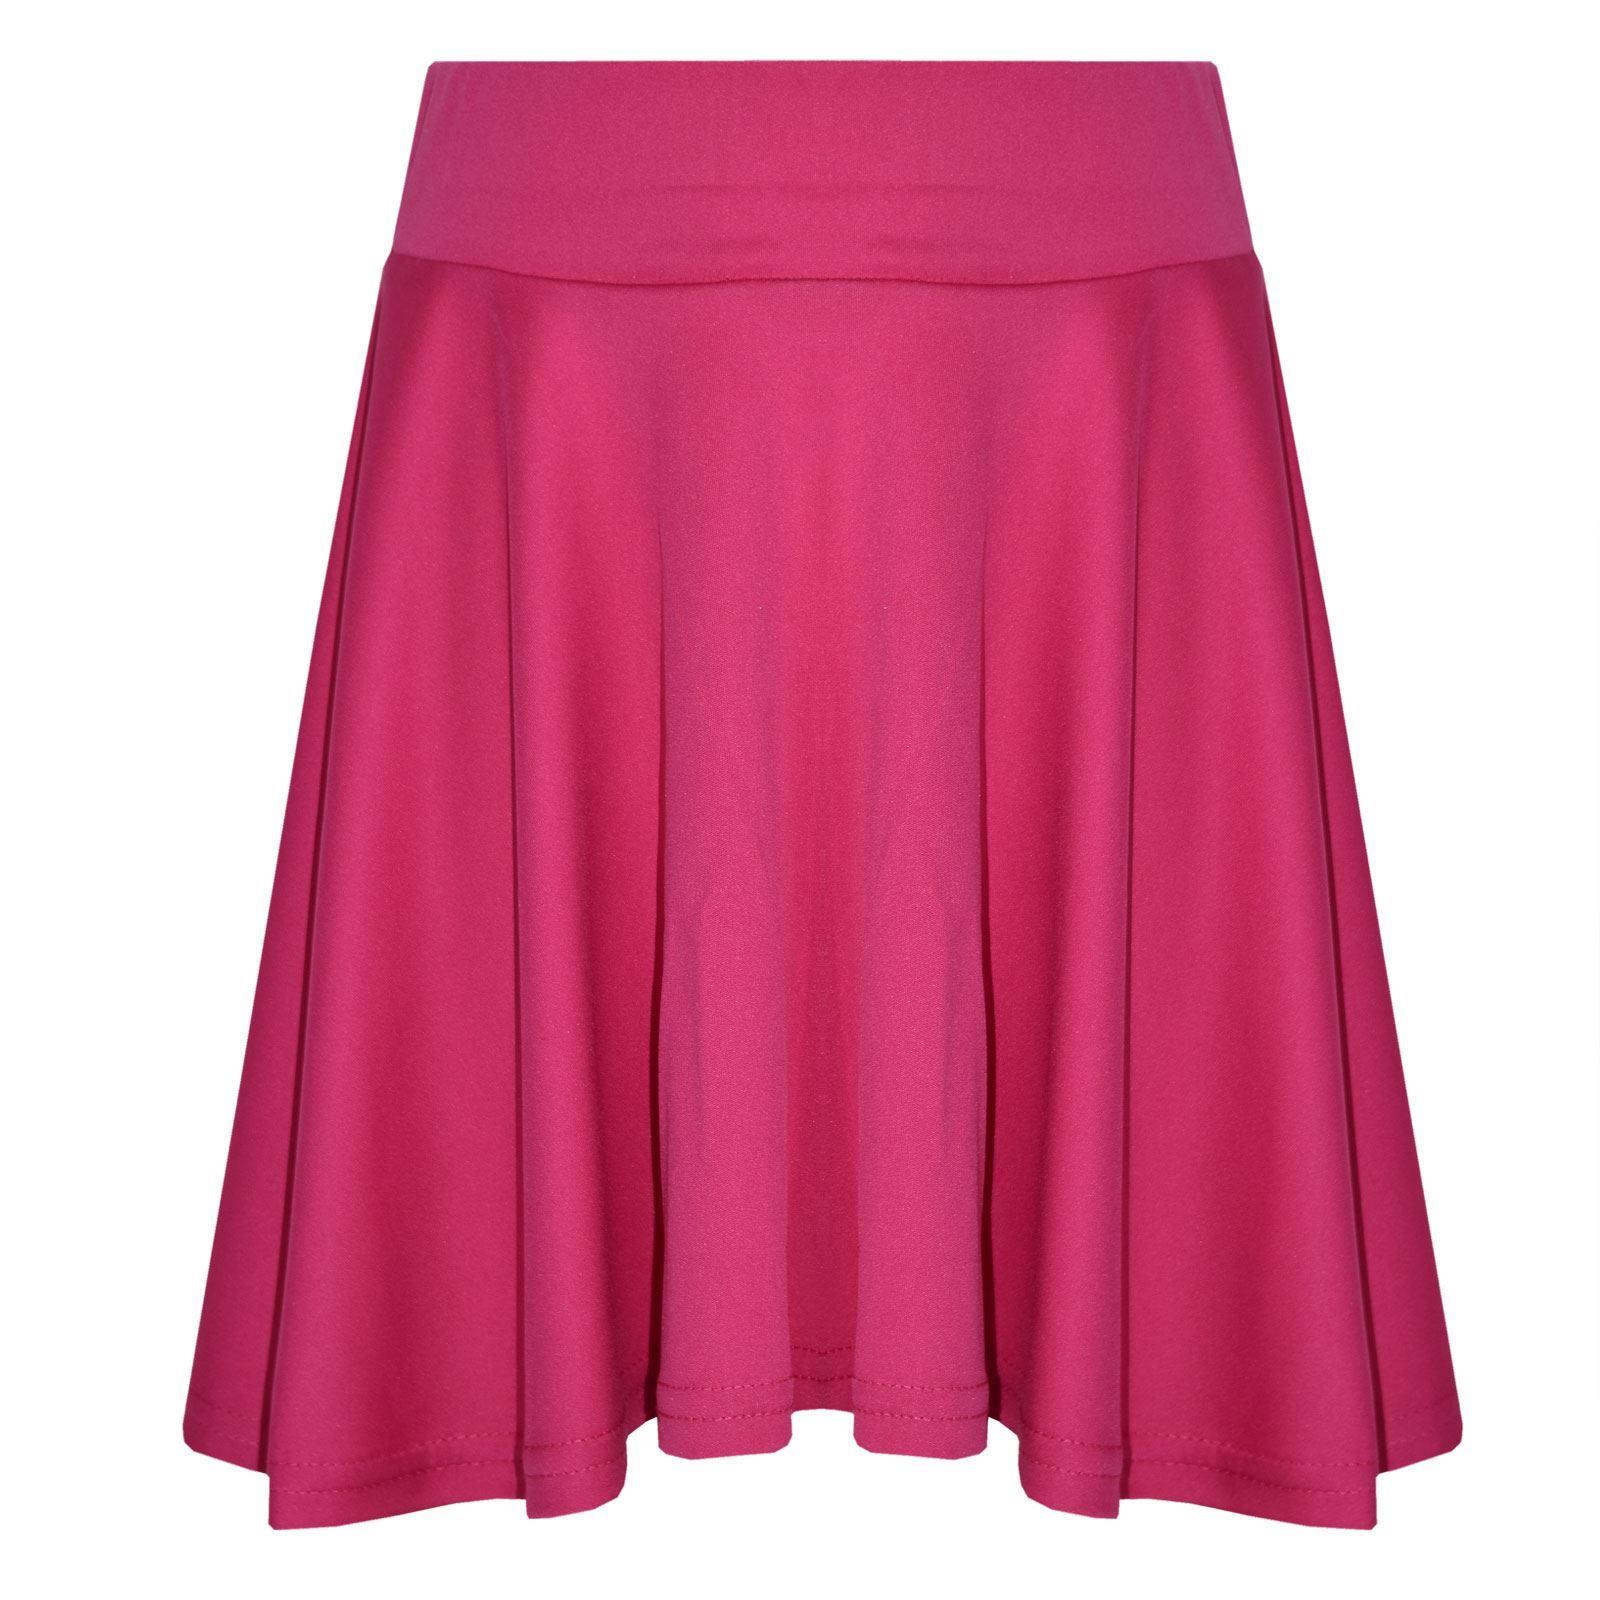 62ee0232c6d8e Girls Skater Skirt Kids Neon Bright Mini Fashion Skirts 7 8 9 10 11 ...